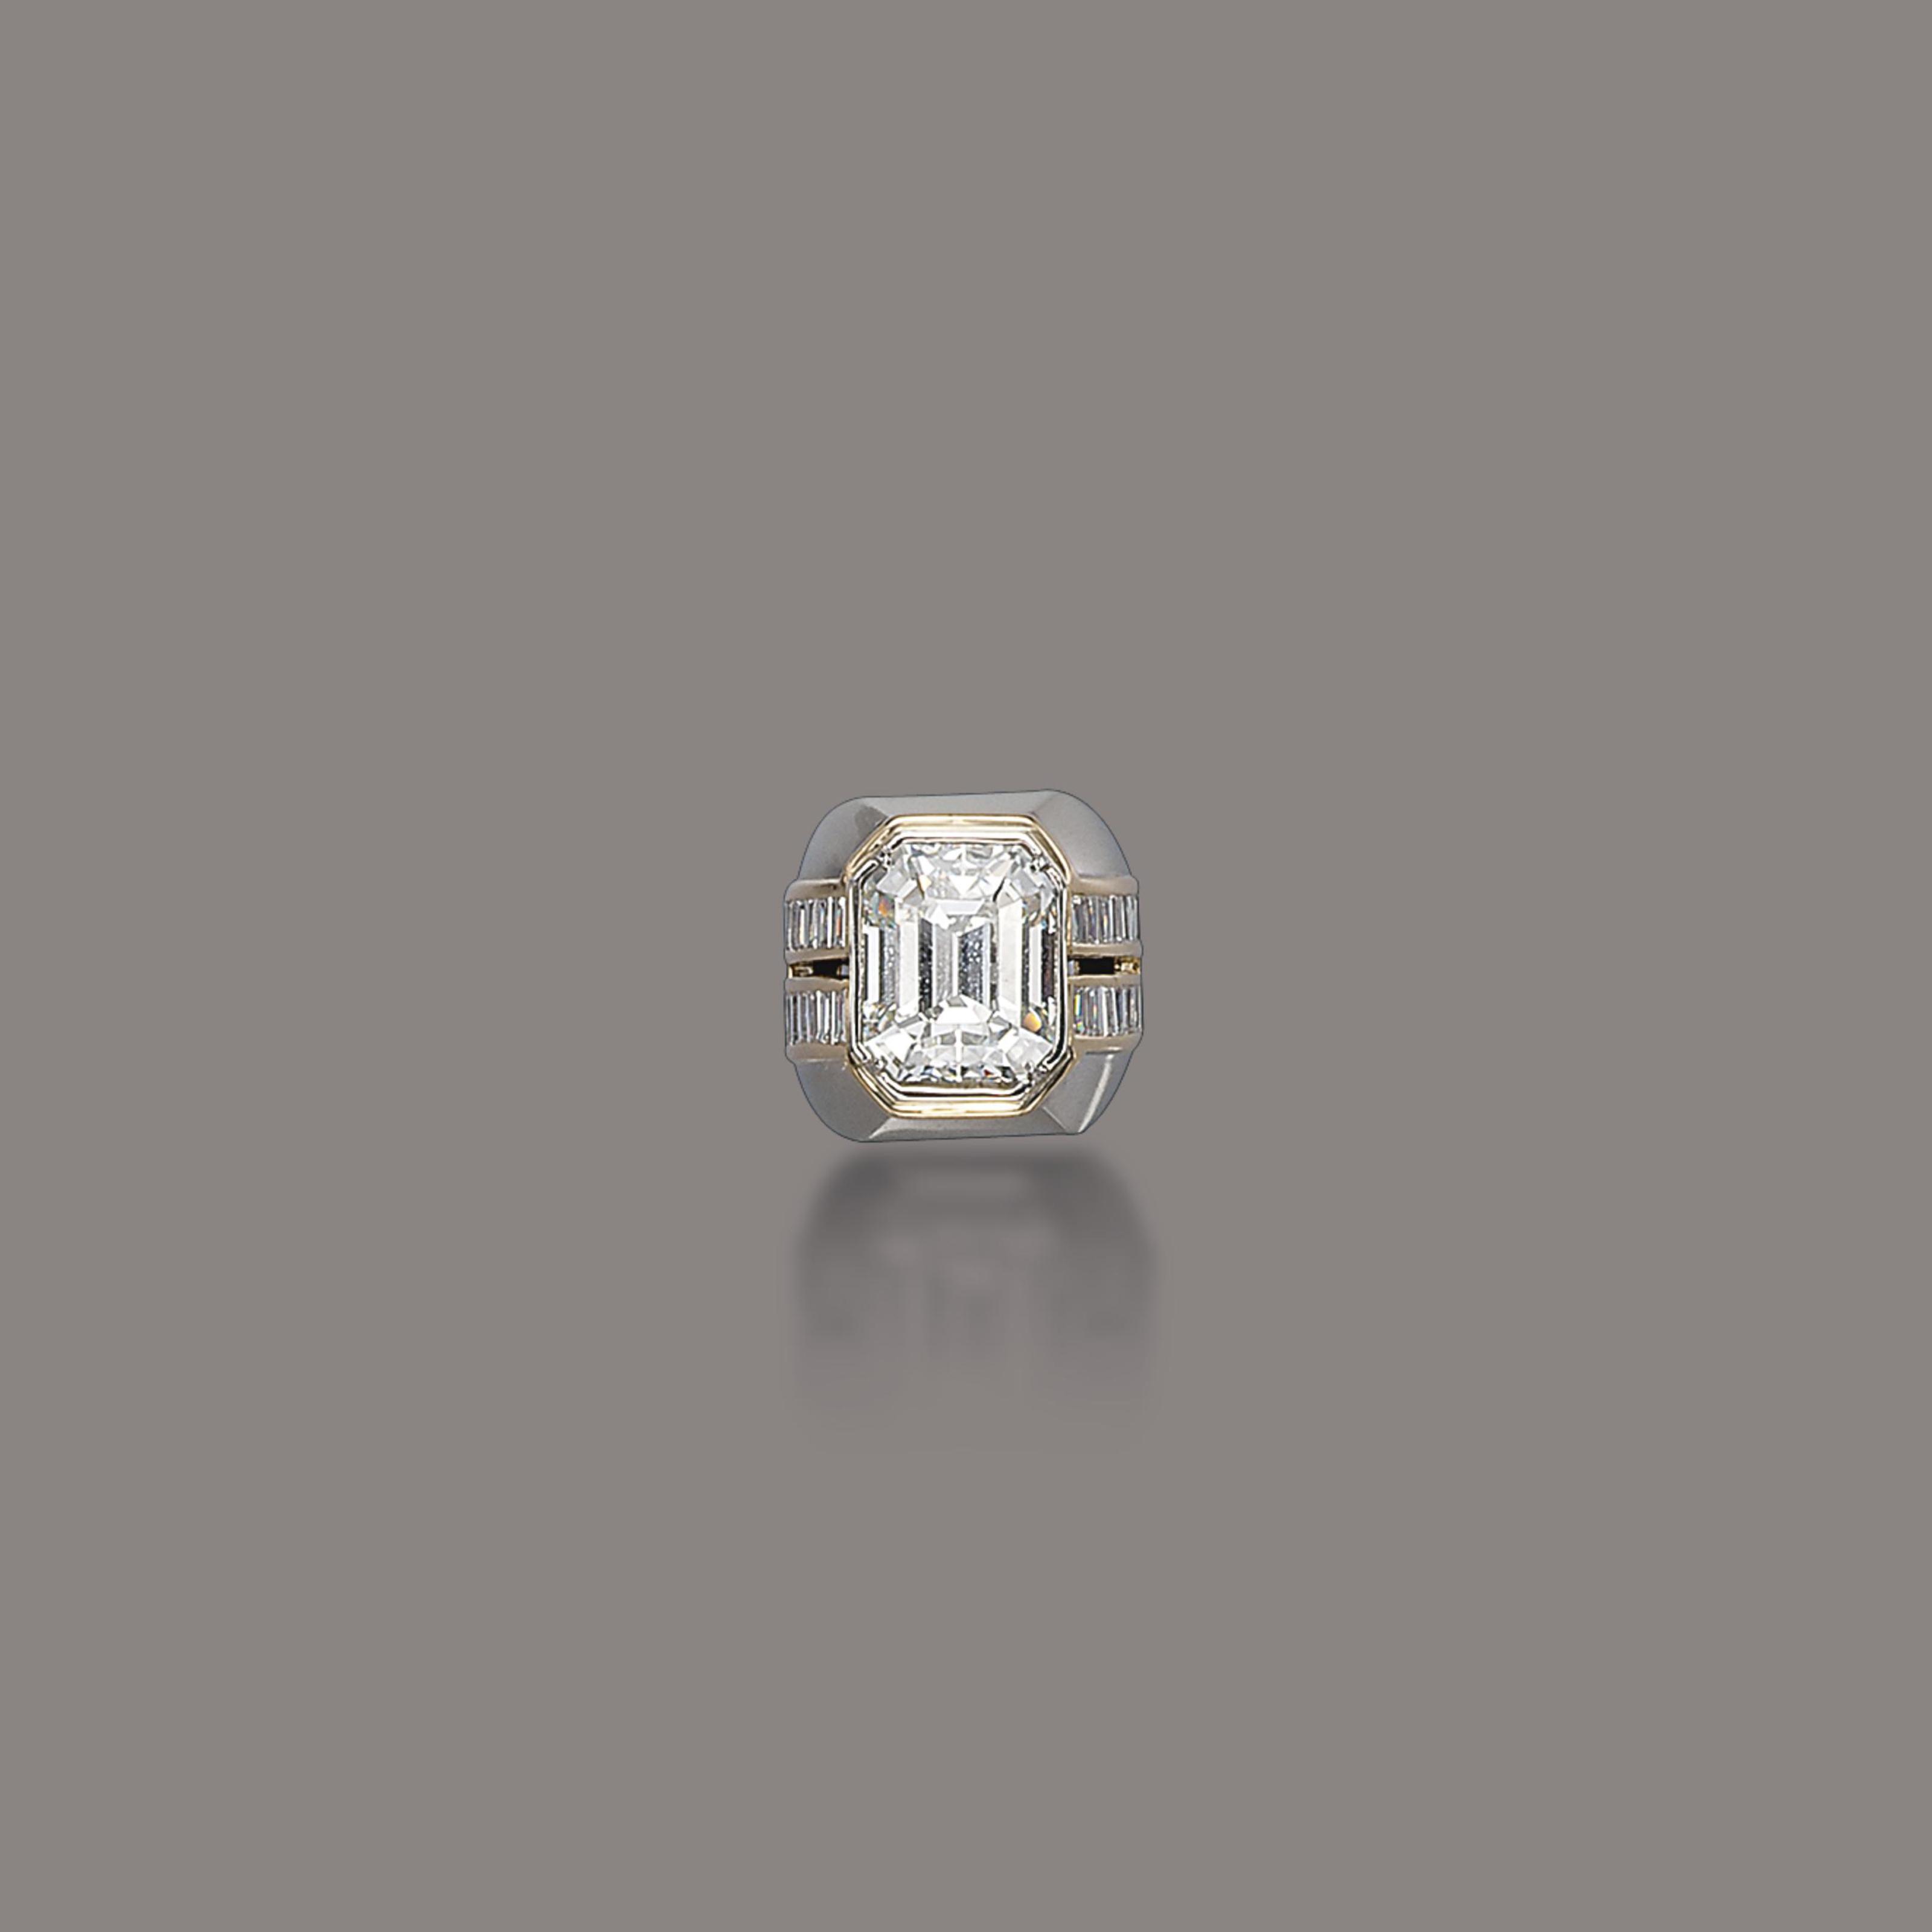 A DIAMOND RING, BY REPOSSI